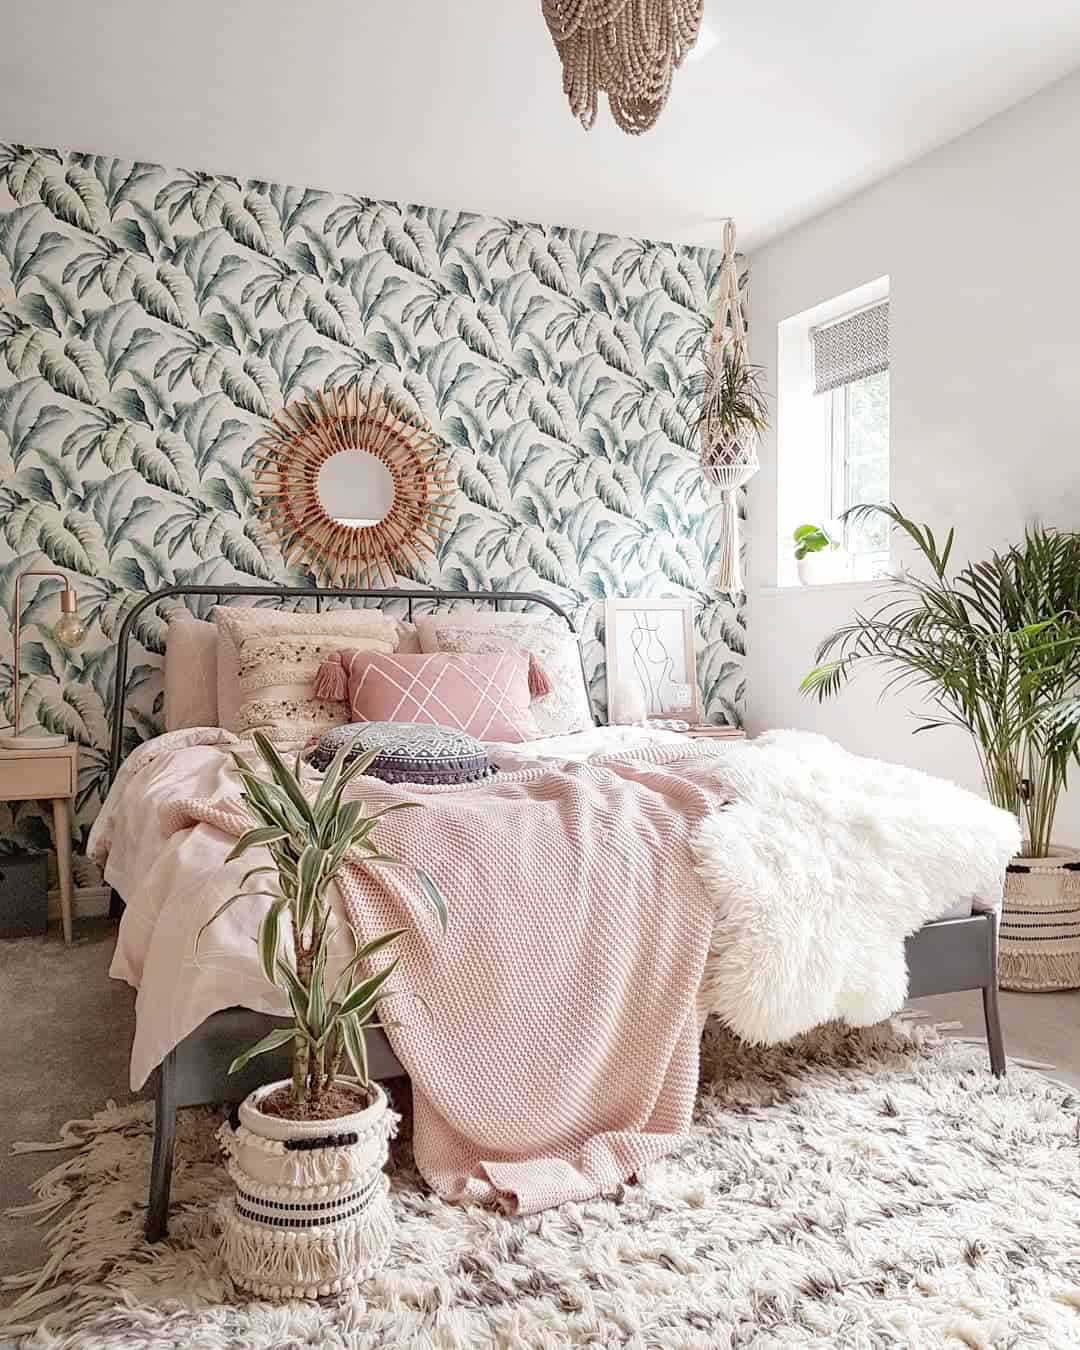 22 Dreamy Boho Bedroom Design Ideas on Boho Bedroom Decor  id=63481